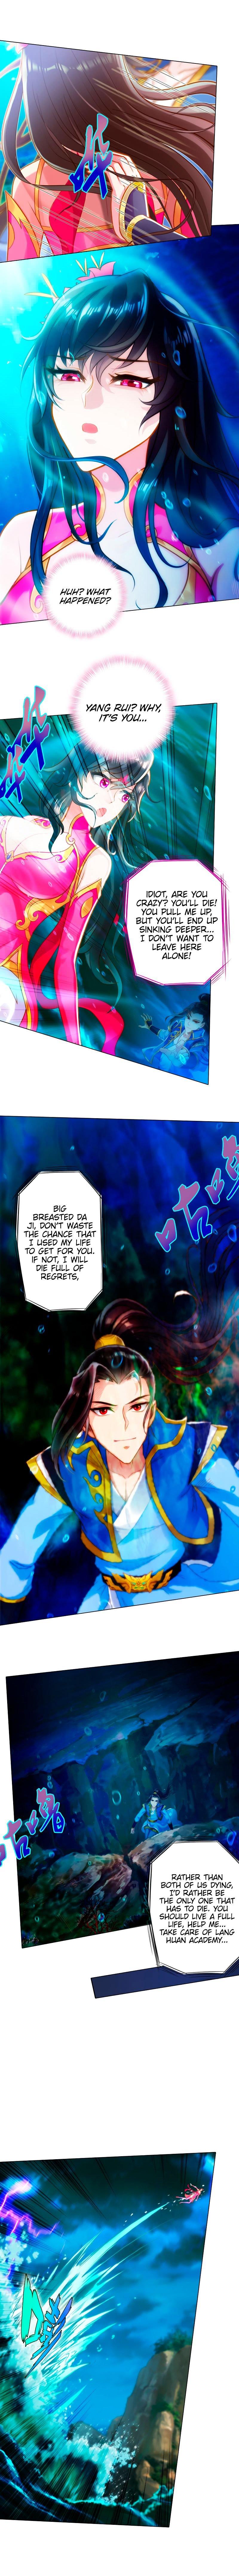 Manga Lang Huan Library - Chapter 78 Page 9